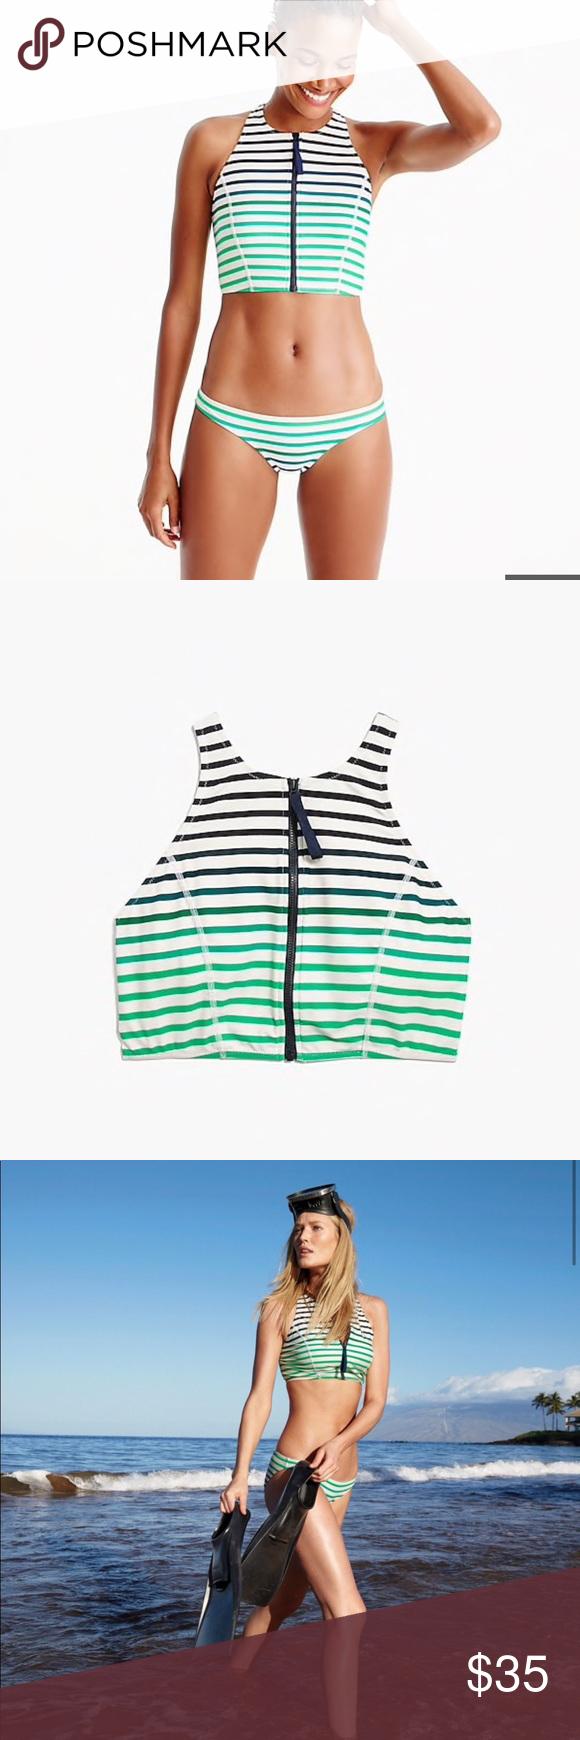 899c450e09 Jcrew zip front bikini top ombré stripe S Great condition with no flaws.  Size small. J. Crew Swim Bikinis